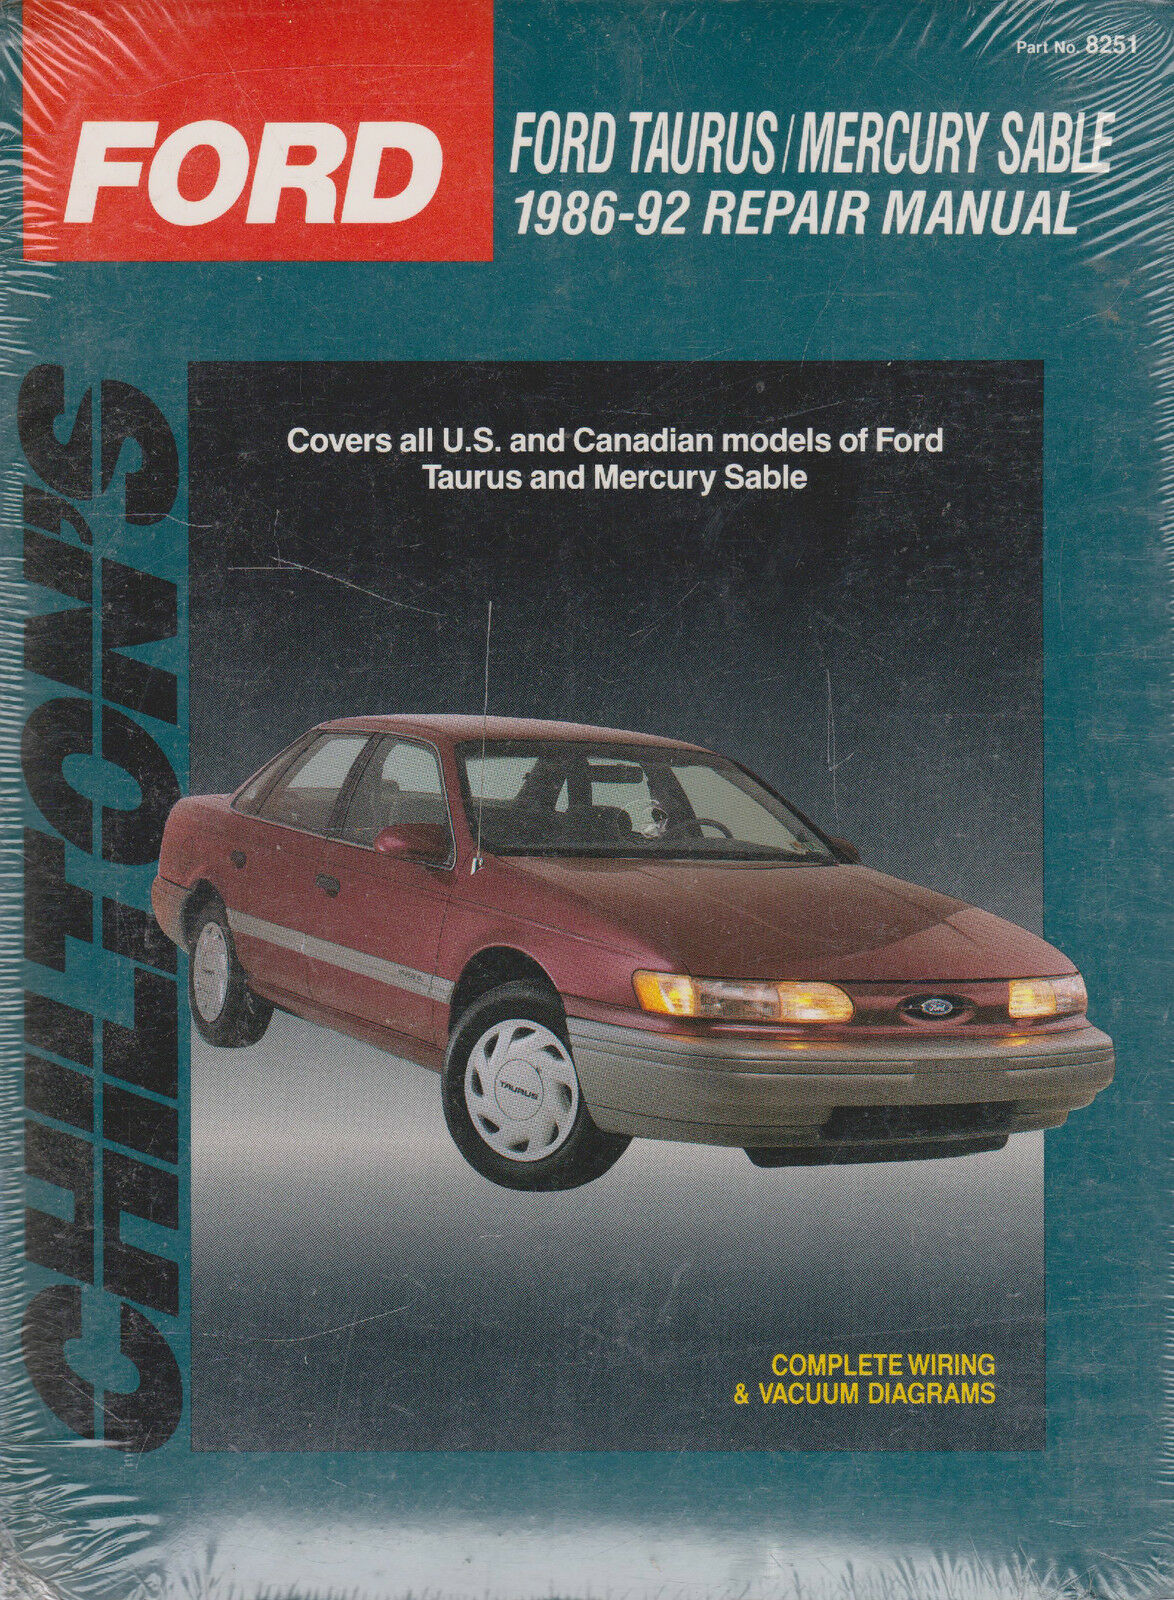 haynes repair manuals ford taurus mercury sable 1986 92 by chilton rh ebay com 2001 Ford Taurus Parts Diagram 2001 Ford Taurus Interior